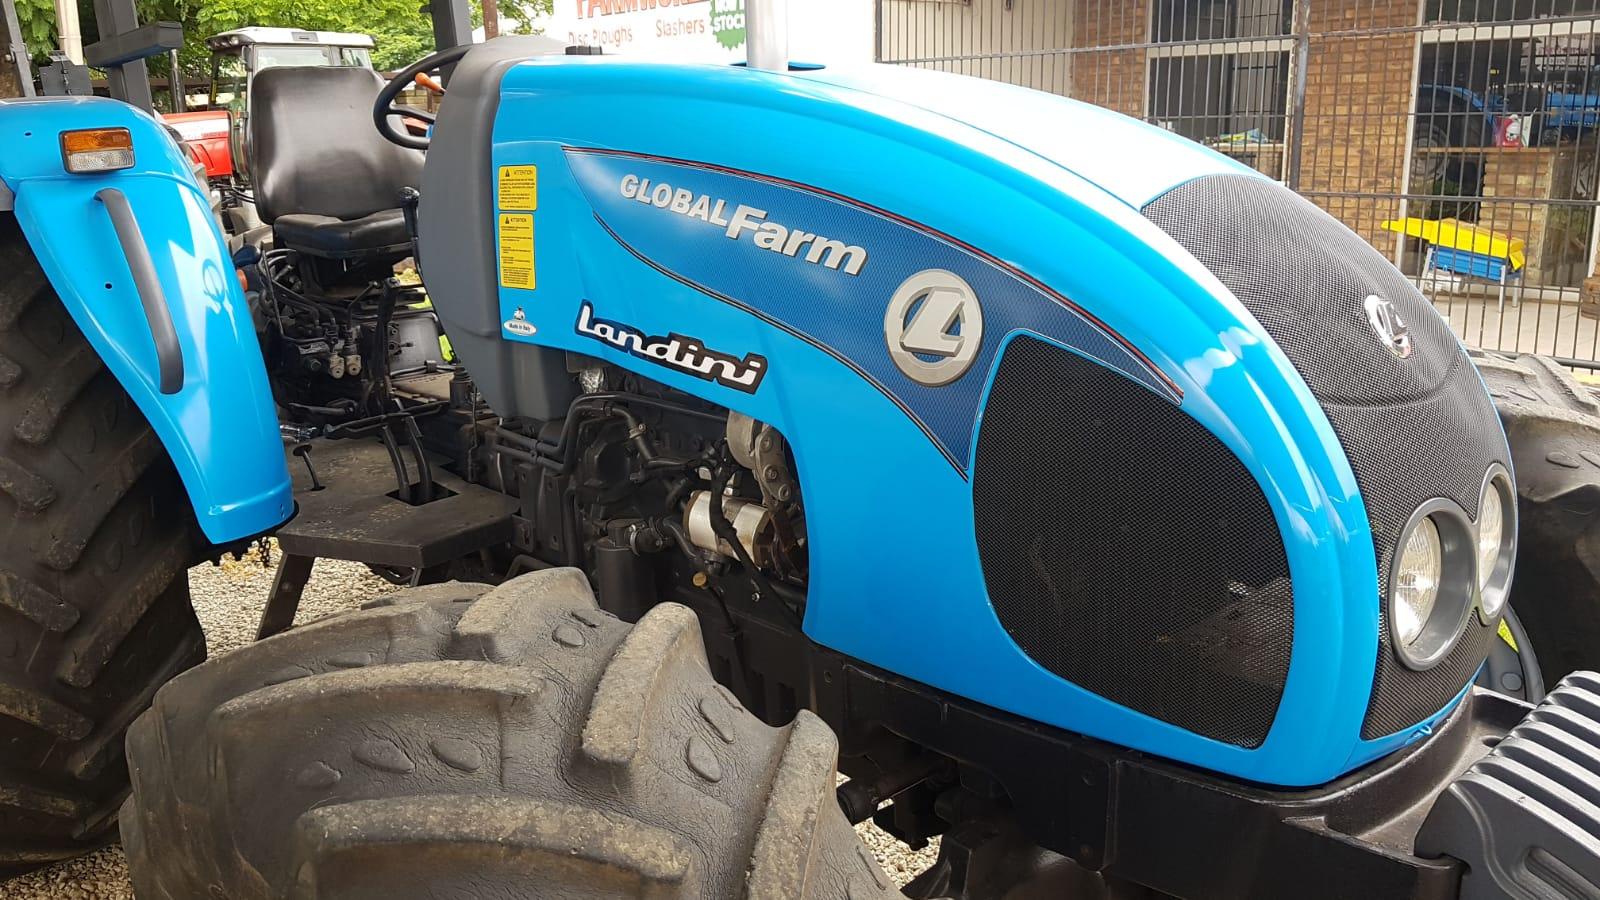 2011 Landini Globalfarm 95 (4x4) Tractor For Sale